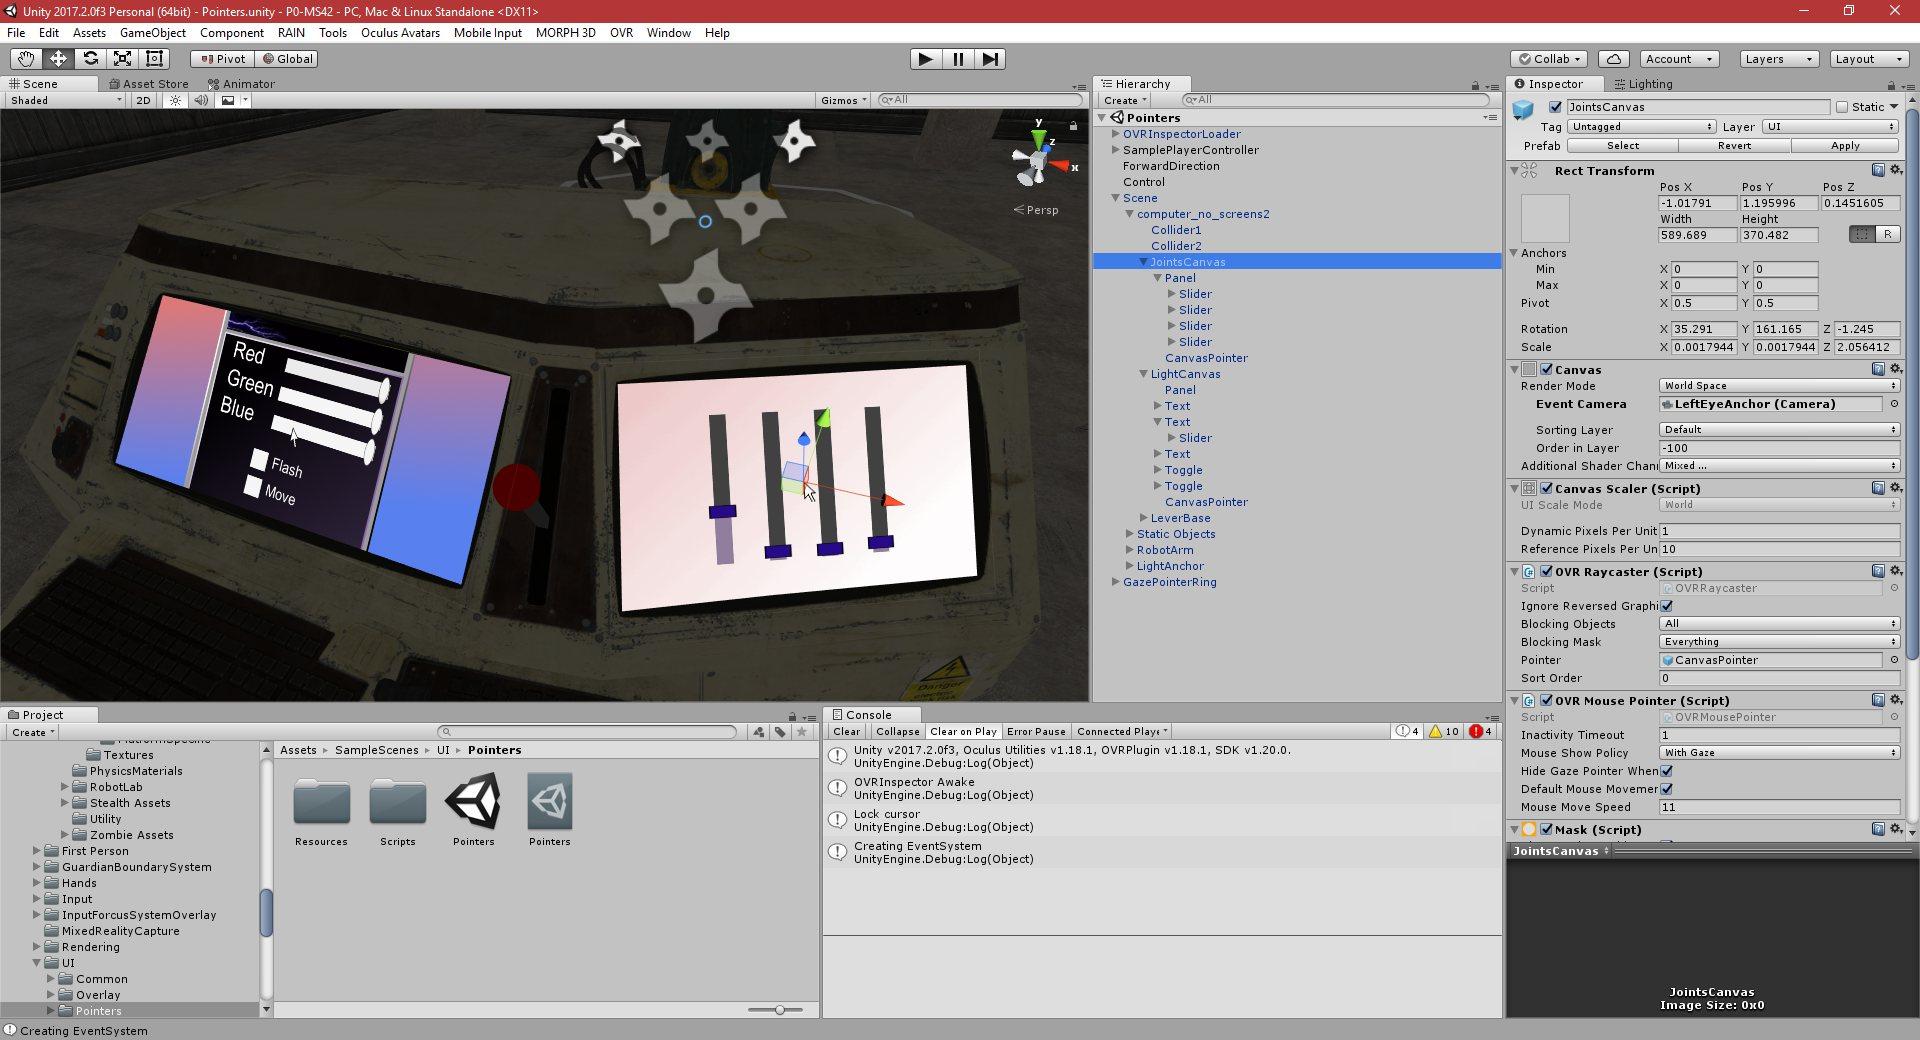 P0-MS4: Part 272: VR Testing, Integration - PGD Home